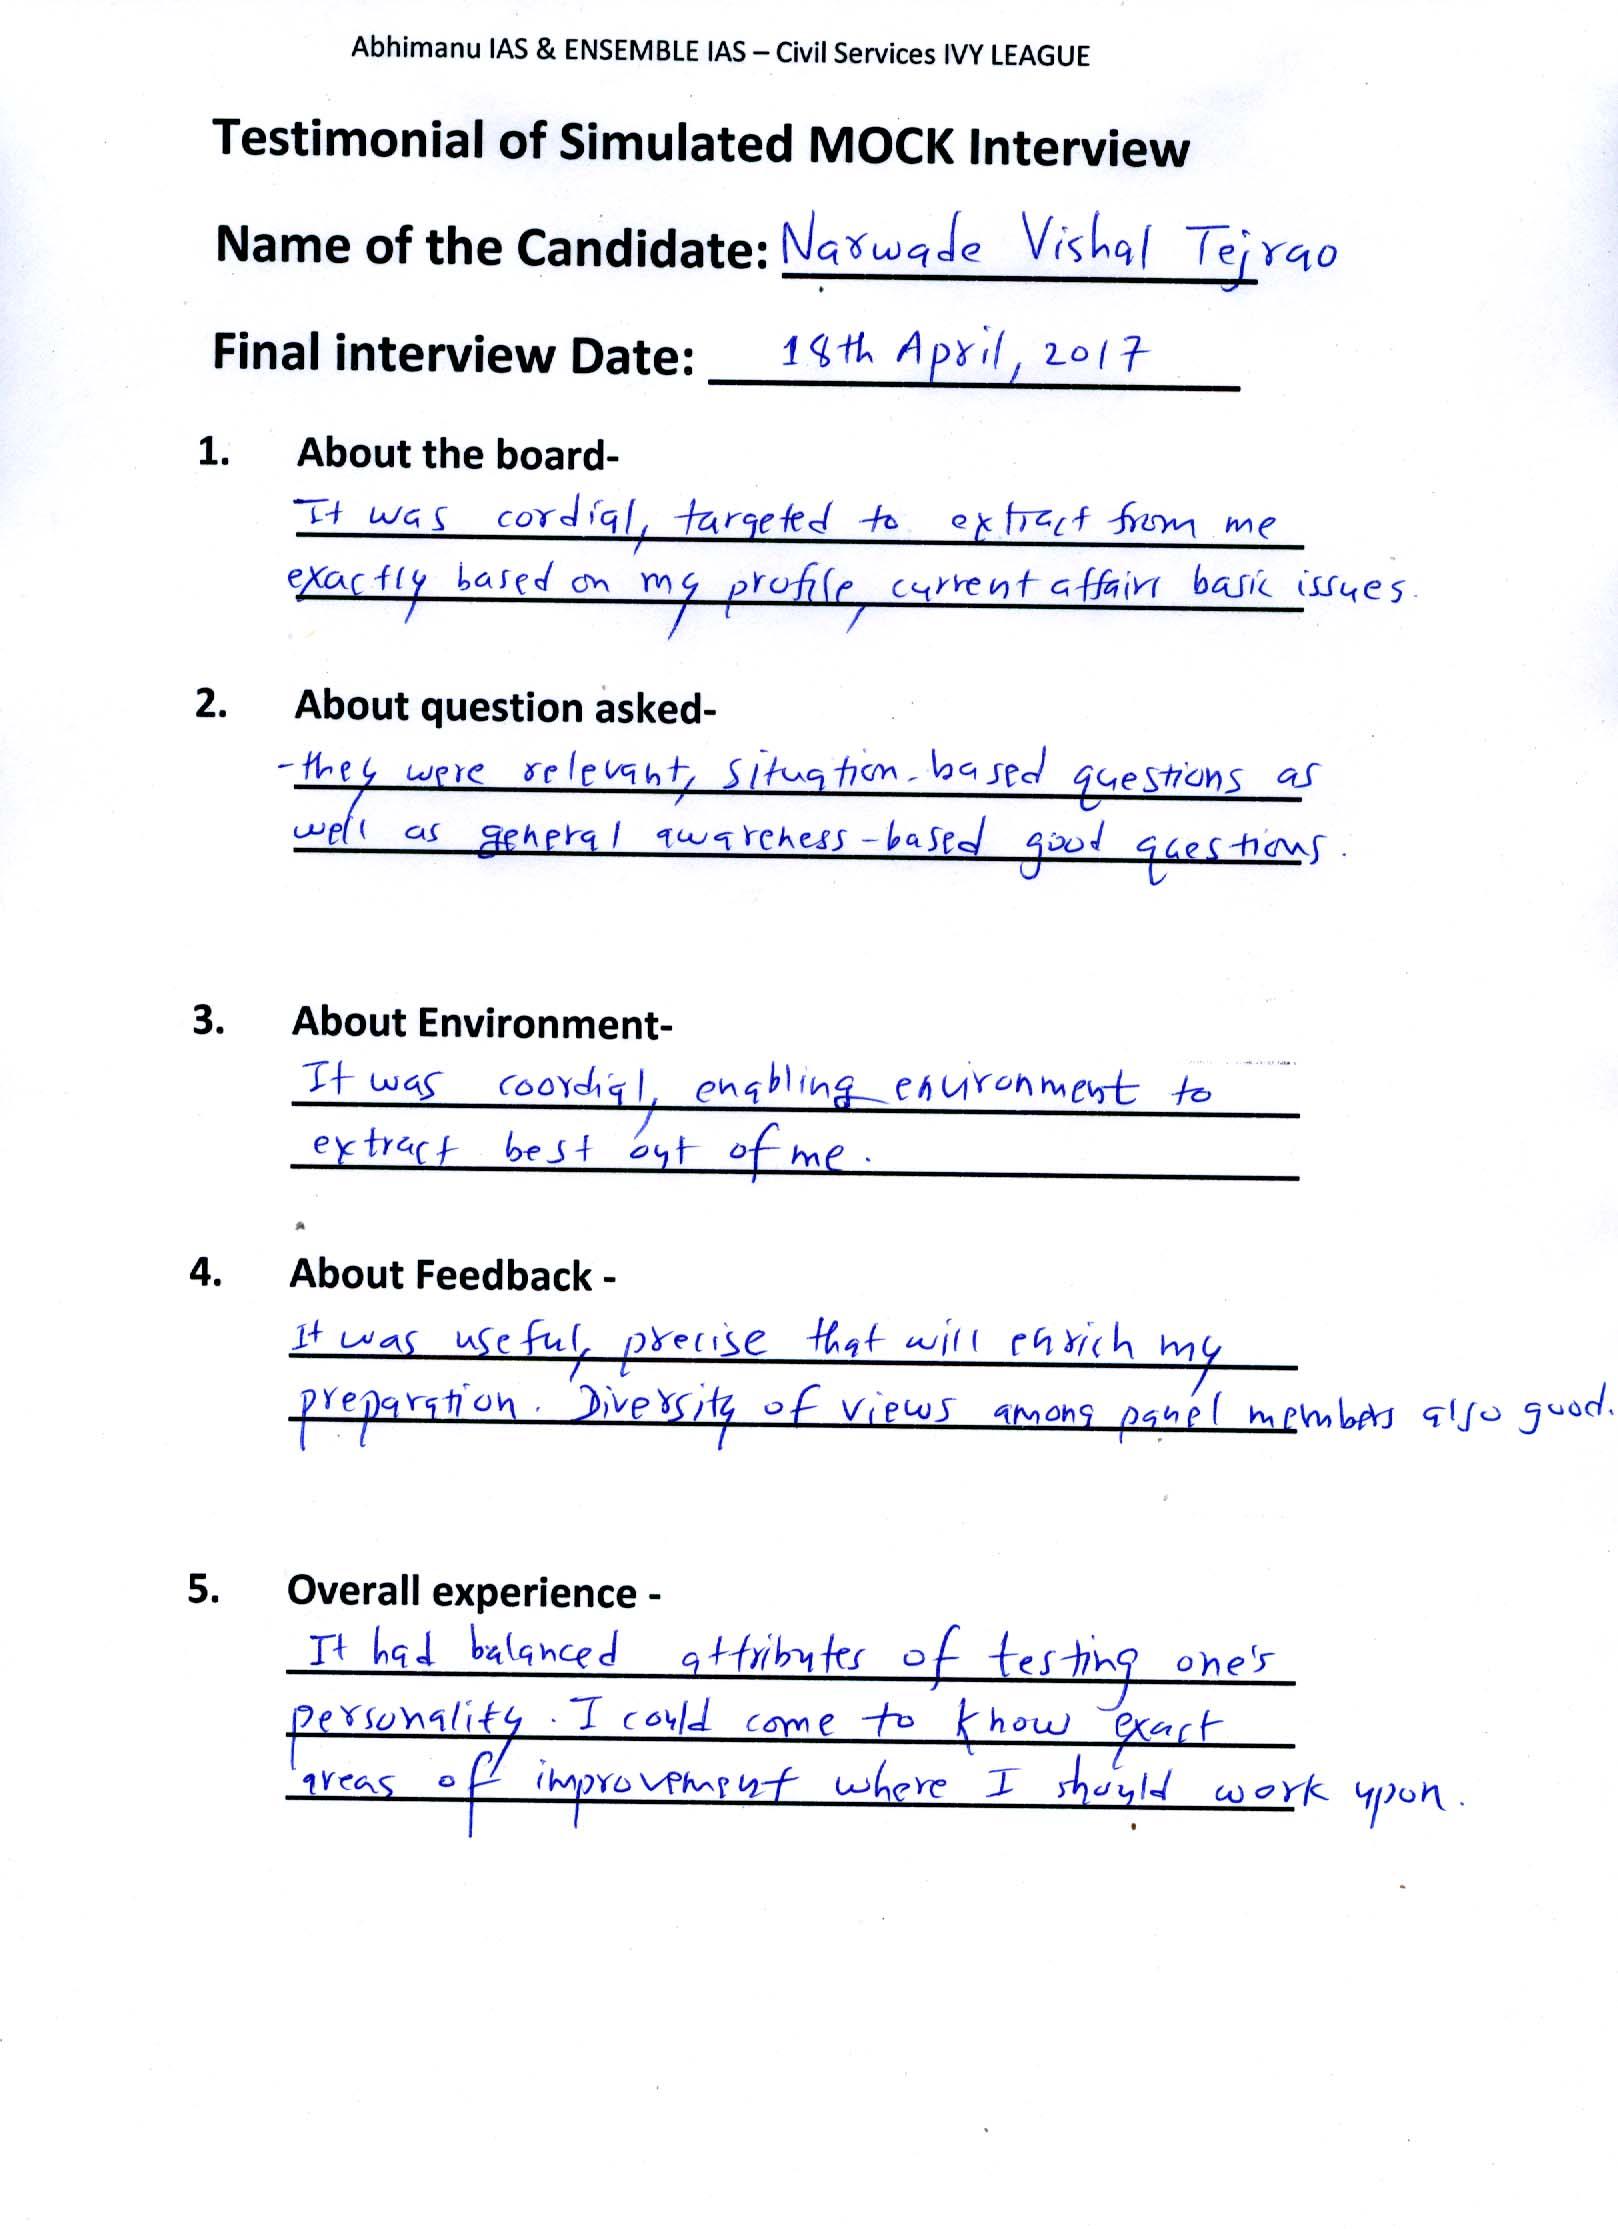 Interview Testimonial By- Narwade Vishal